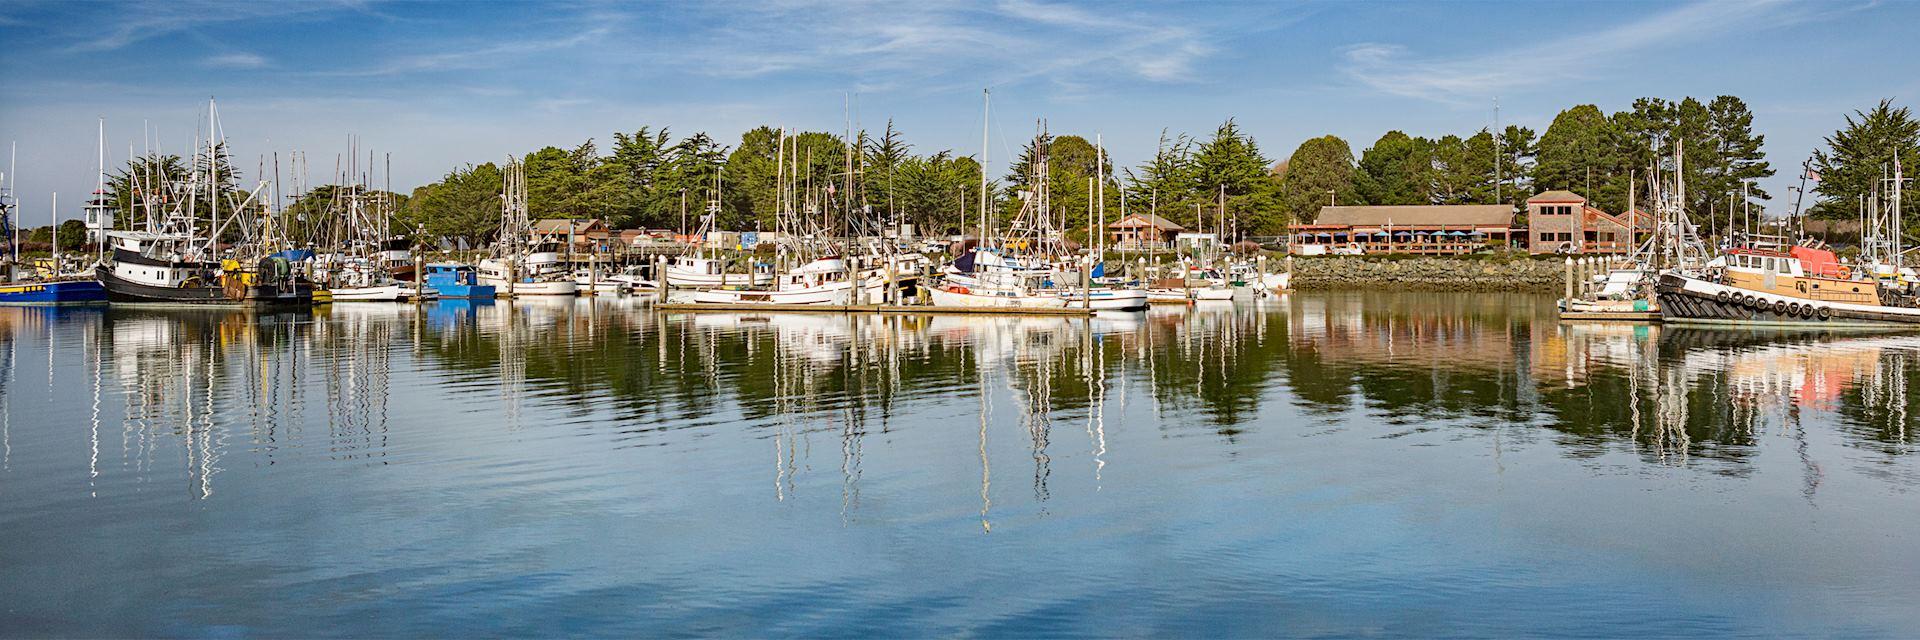 Woodley Island marina, Eureka